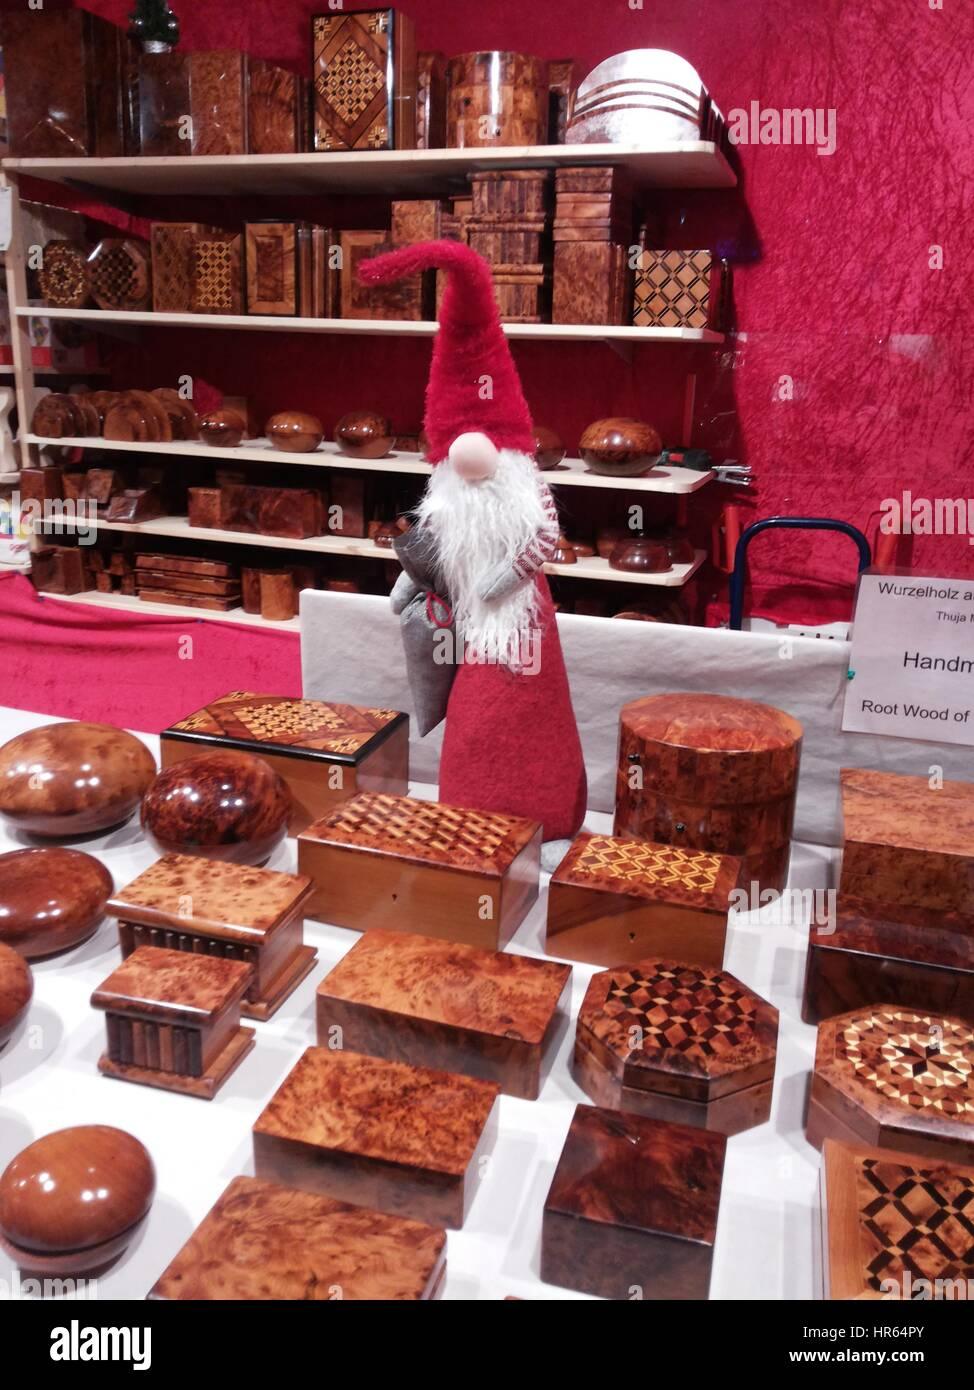 Festive Berlin Christmas Markets and city center, Germany - Stock Image